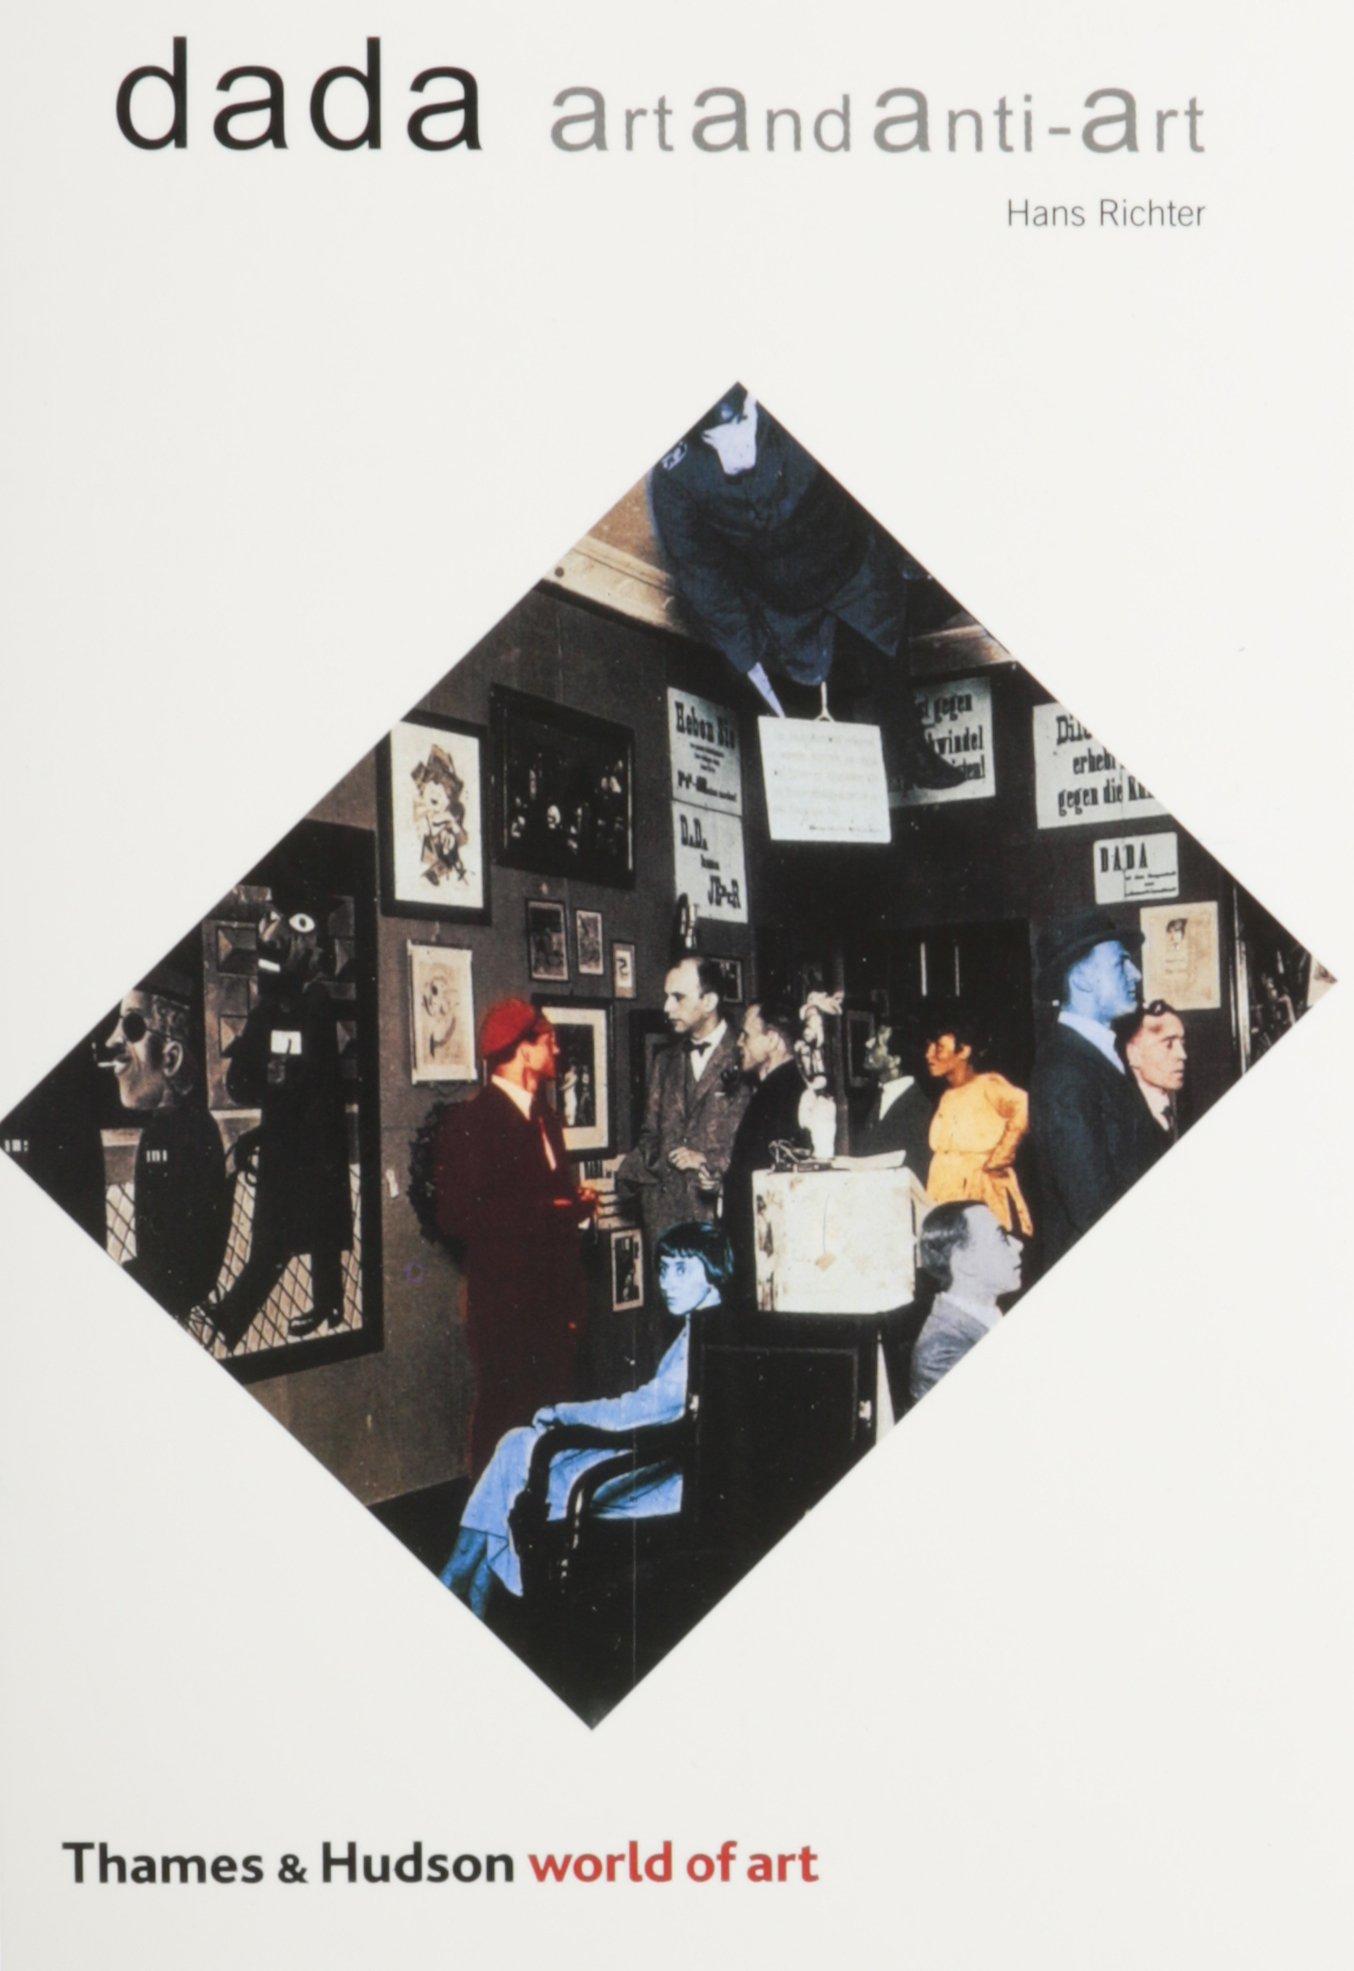 Dada Art and Anti Art World of Art Amazon Hans Richter